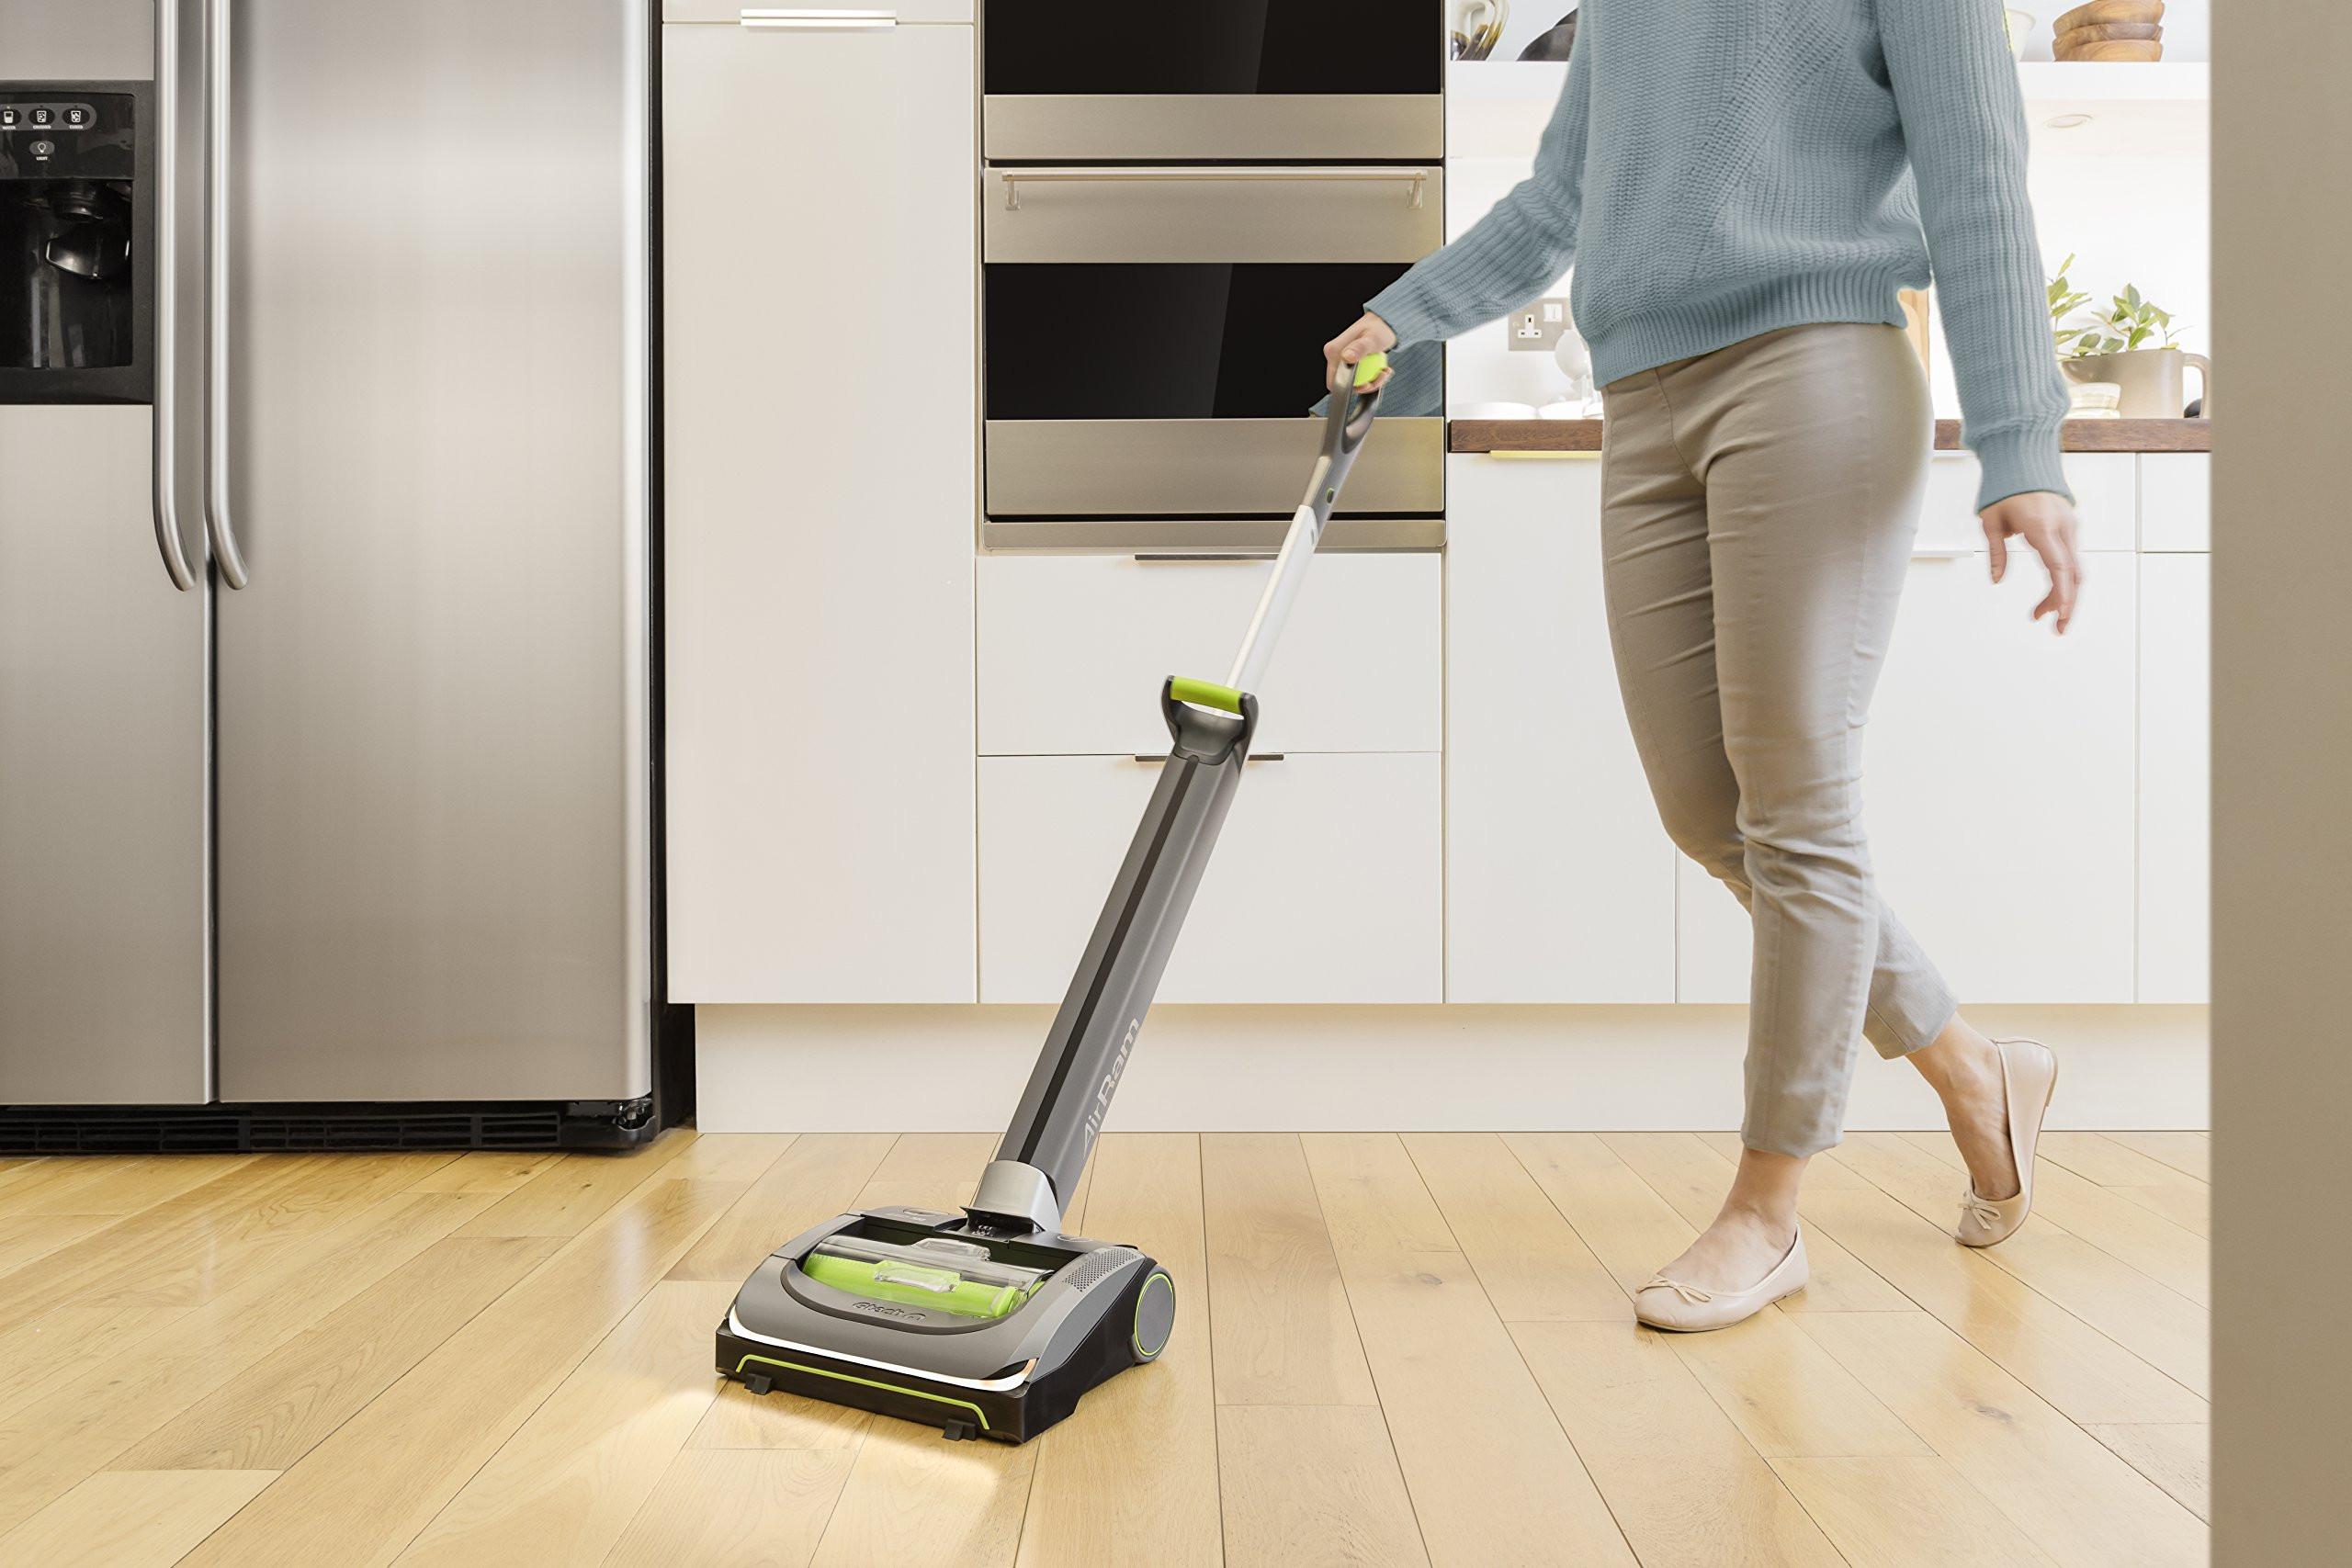 hardwood floor steam cleaner reviews of vacuum and floor care shop amazon uk inside vacuum cleaners